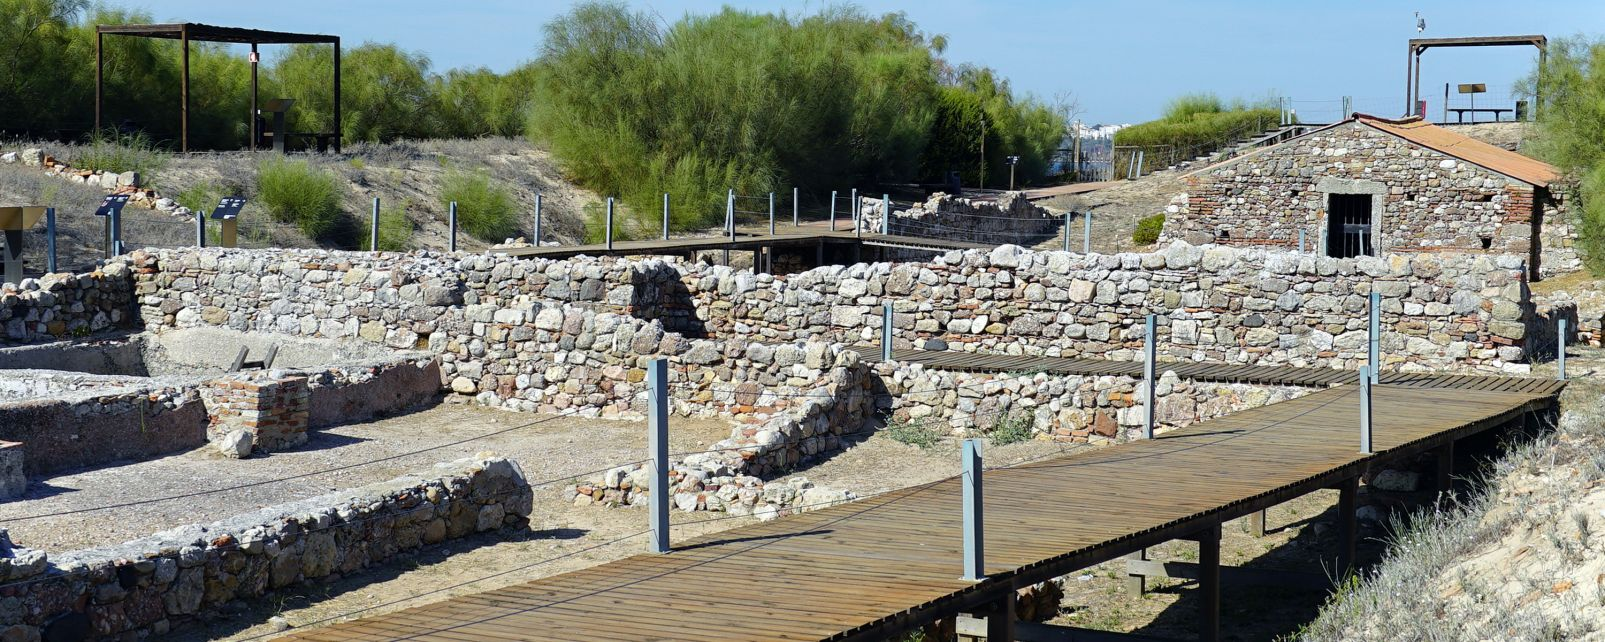 Les monuments et les balades, Europe, Portugal, Alentejo, Troia, Ruines Romaines